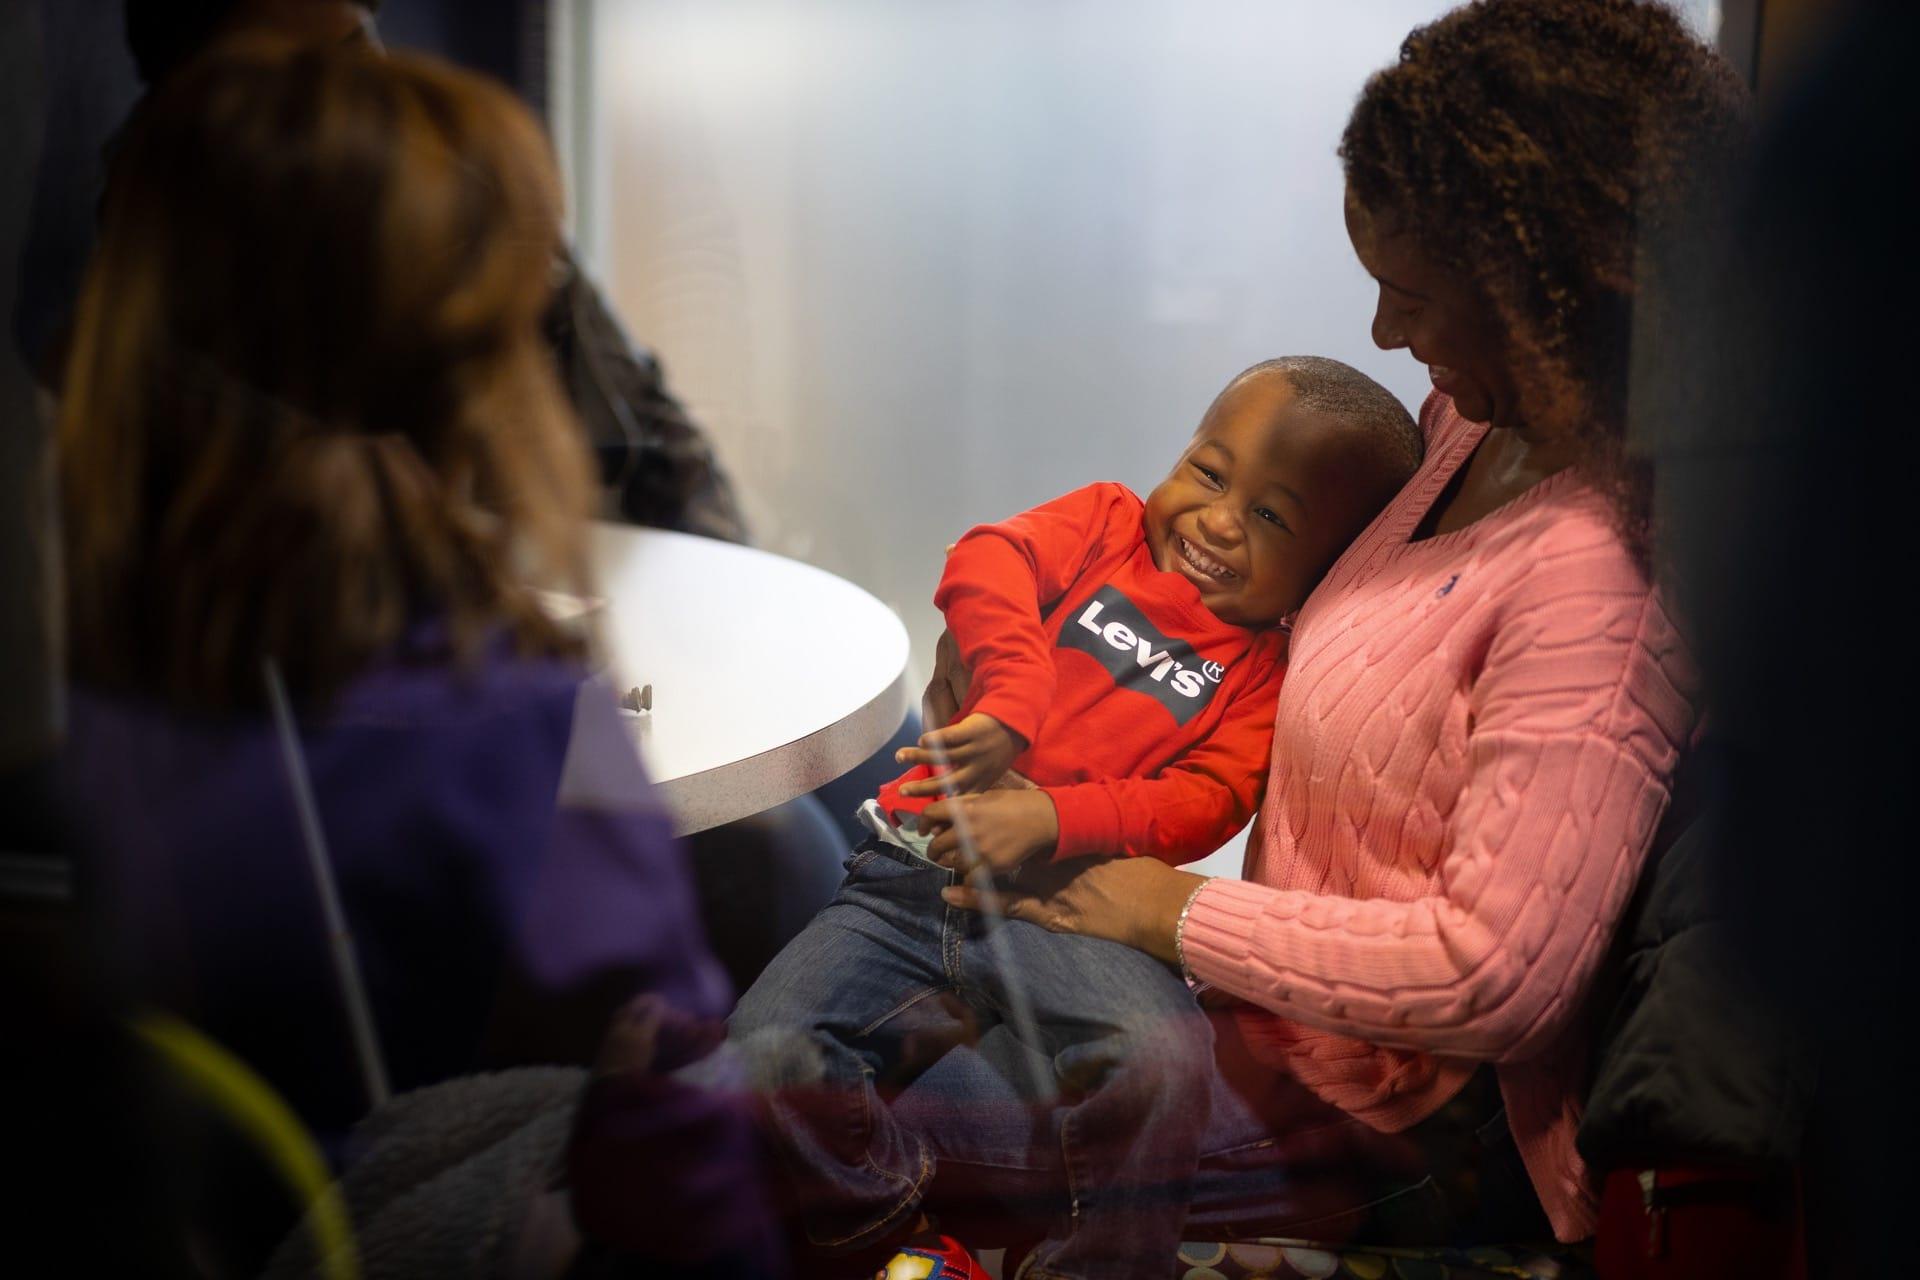 Patient Candids MyKidsDDS Dallas TX Dentist 69 - Treatment For Children